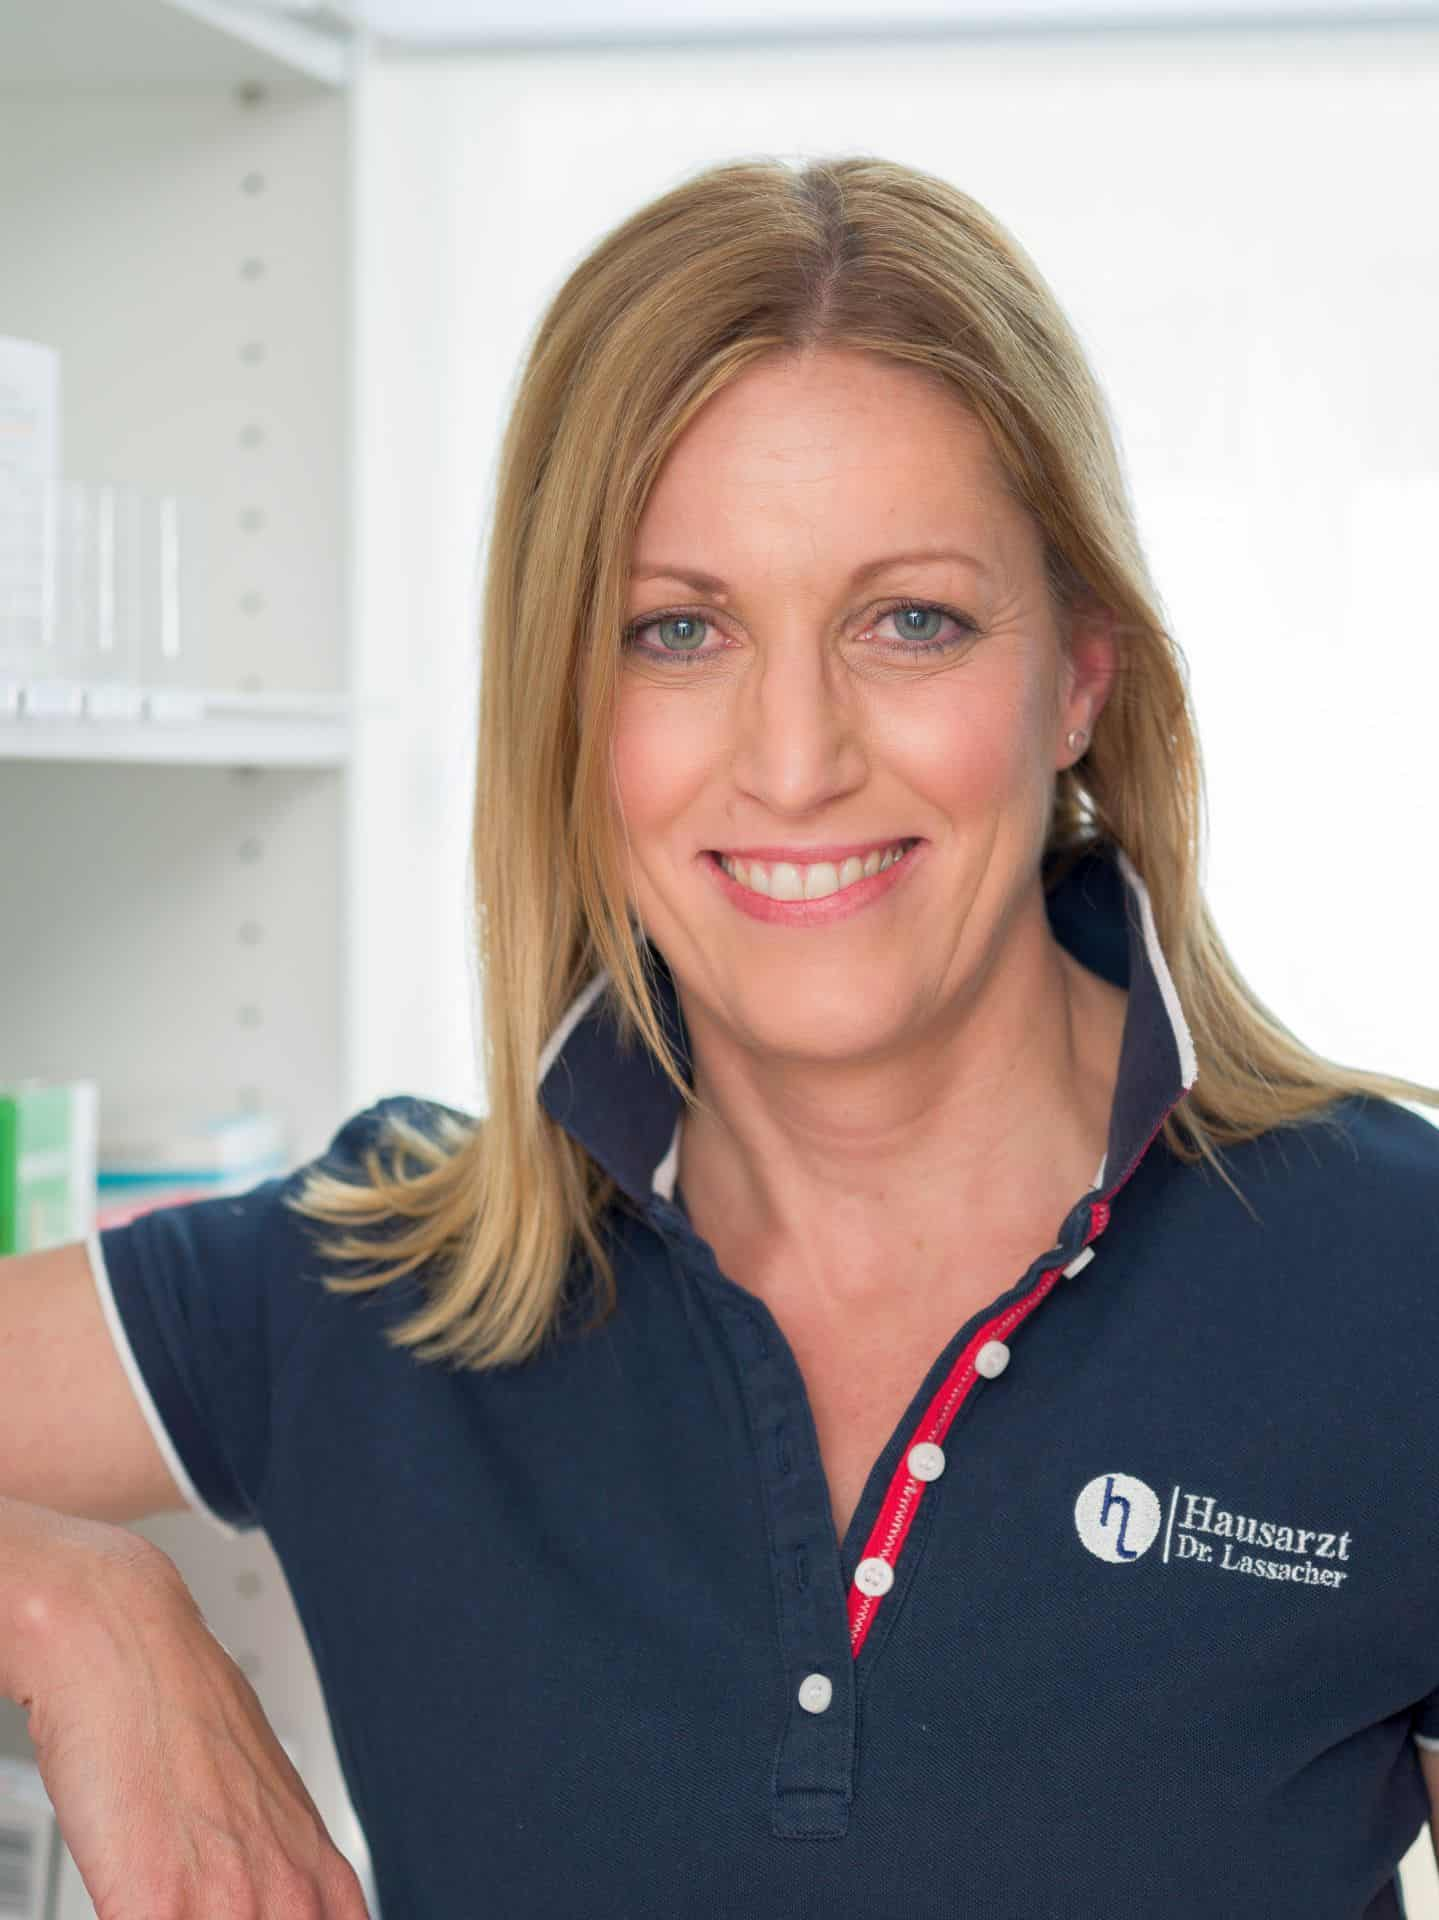 Petra Lassacher - Hausarzt Dr. Lassacher